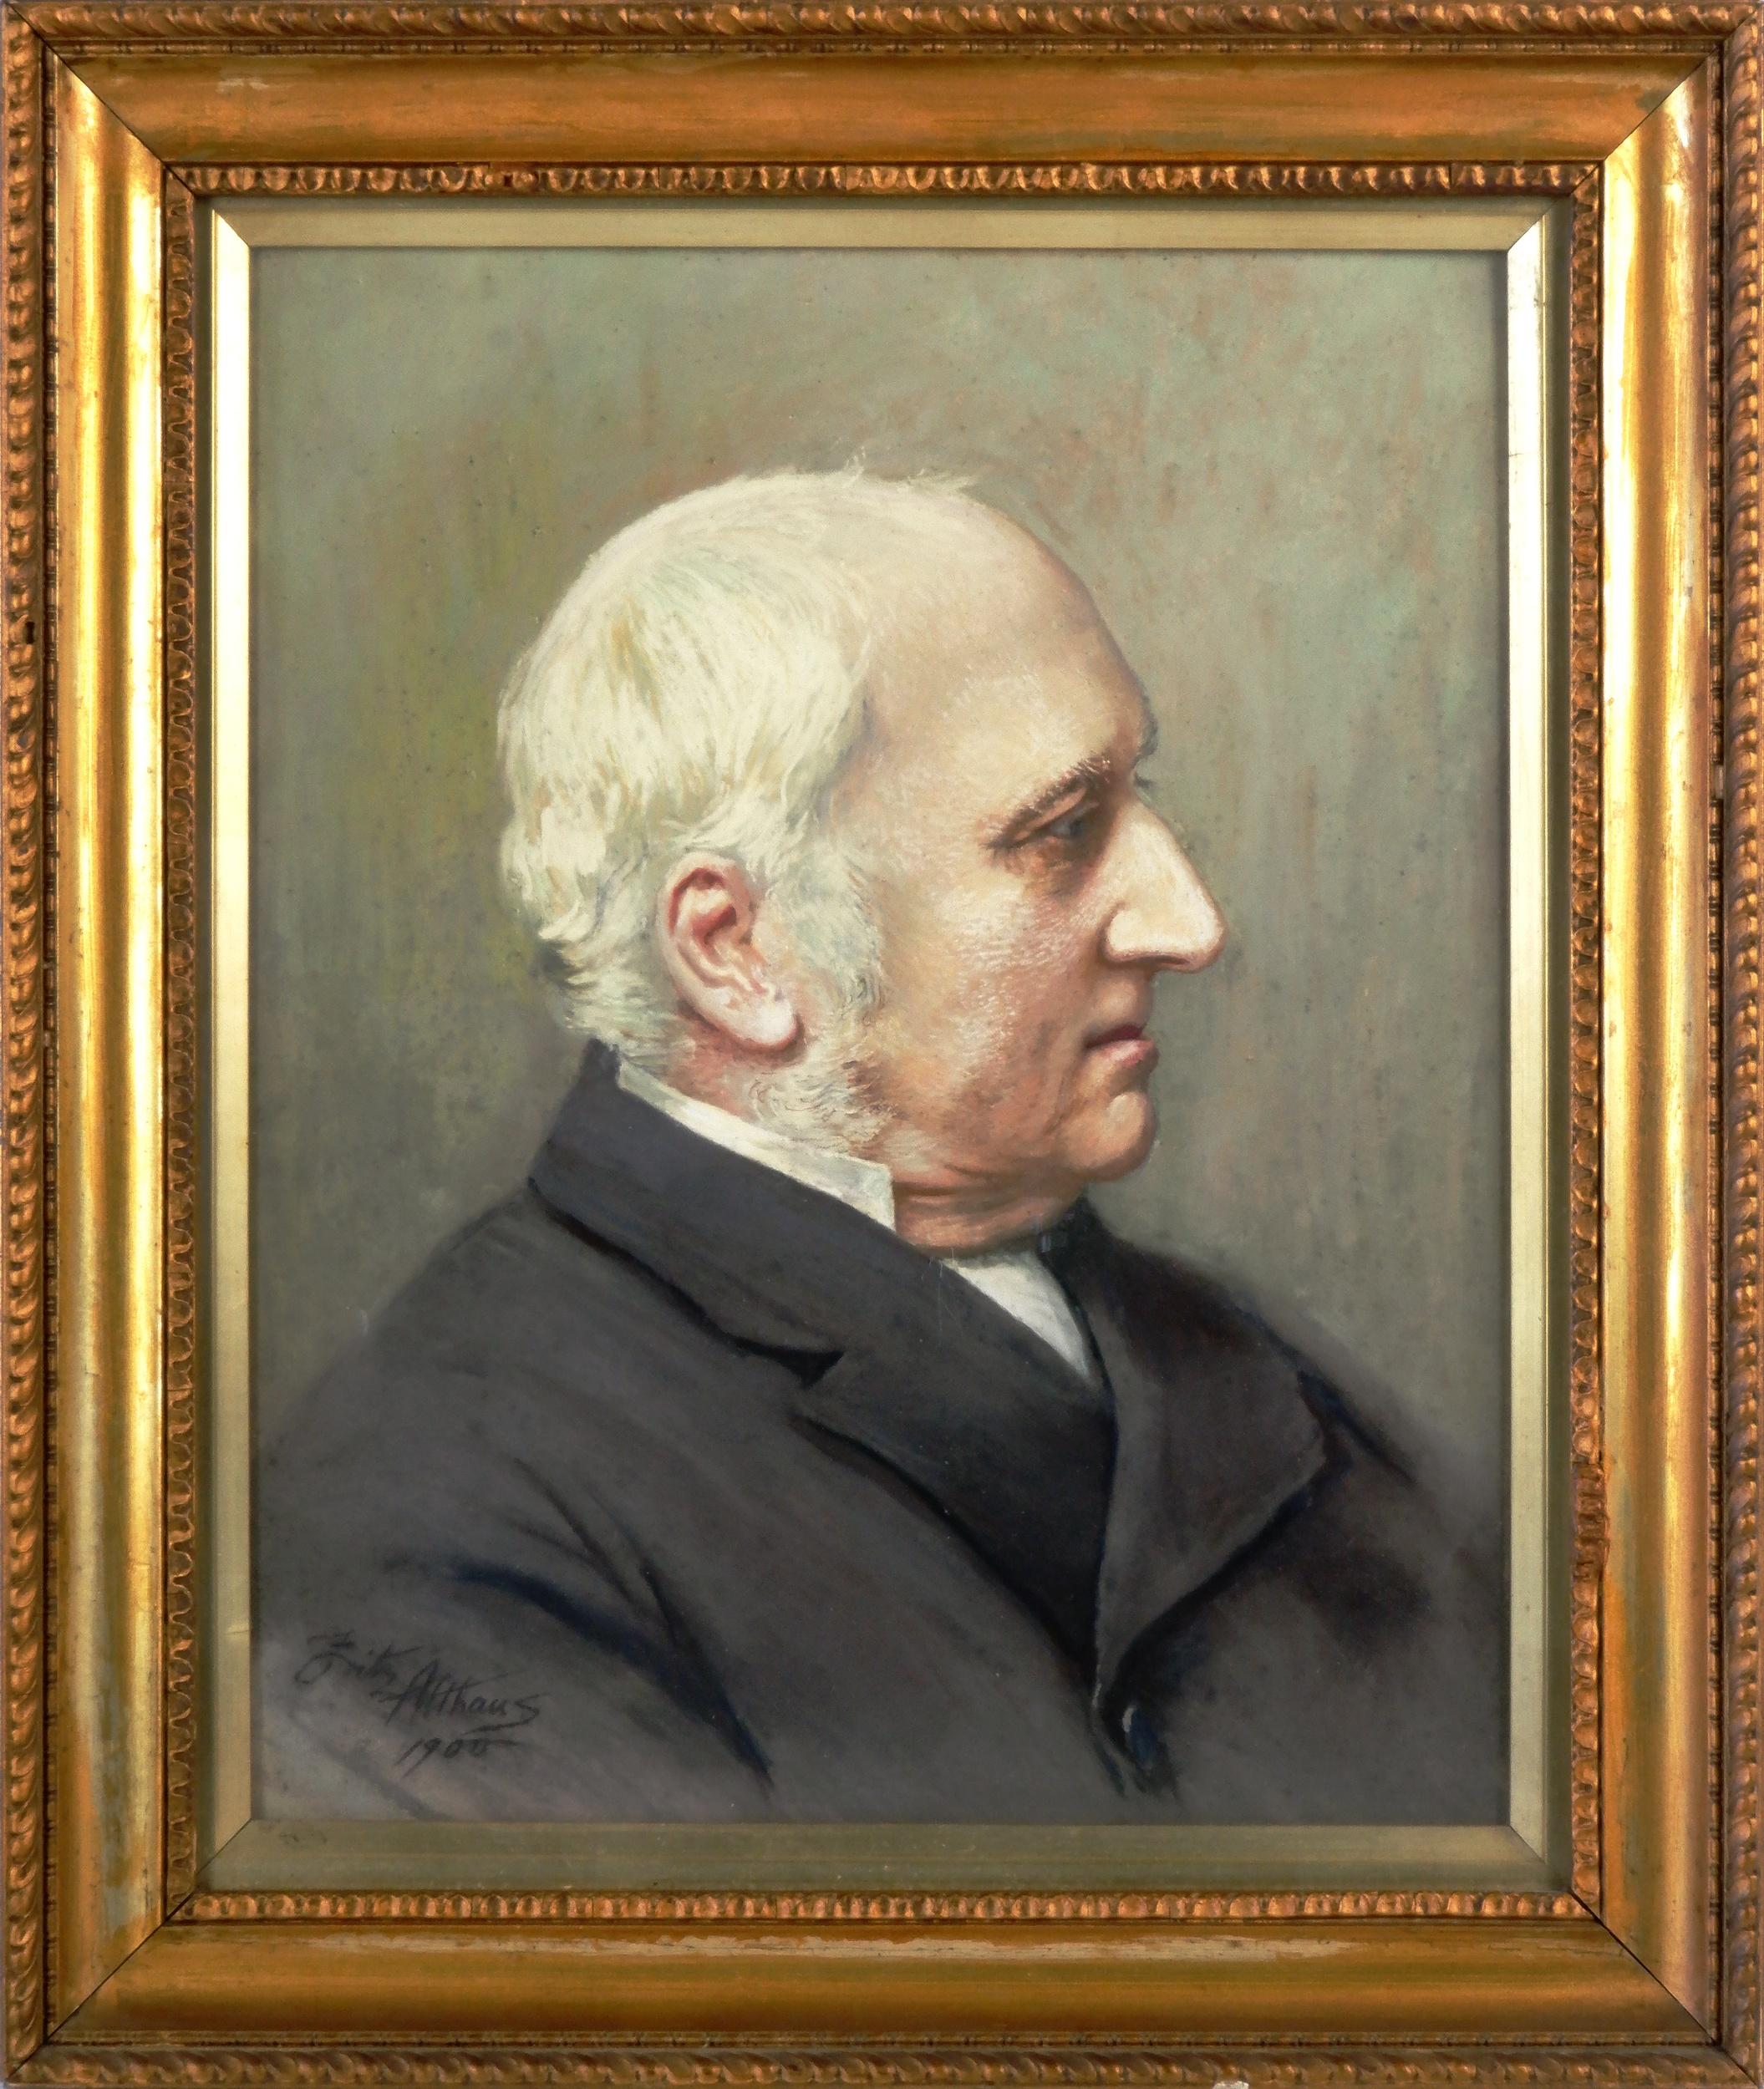 'Fritz Althaus (England 1881-1914) Portrait 1900, Oil on Board'